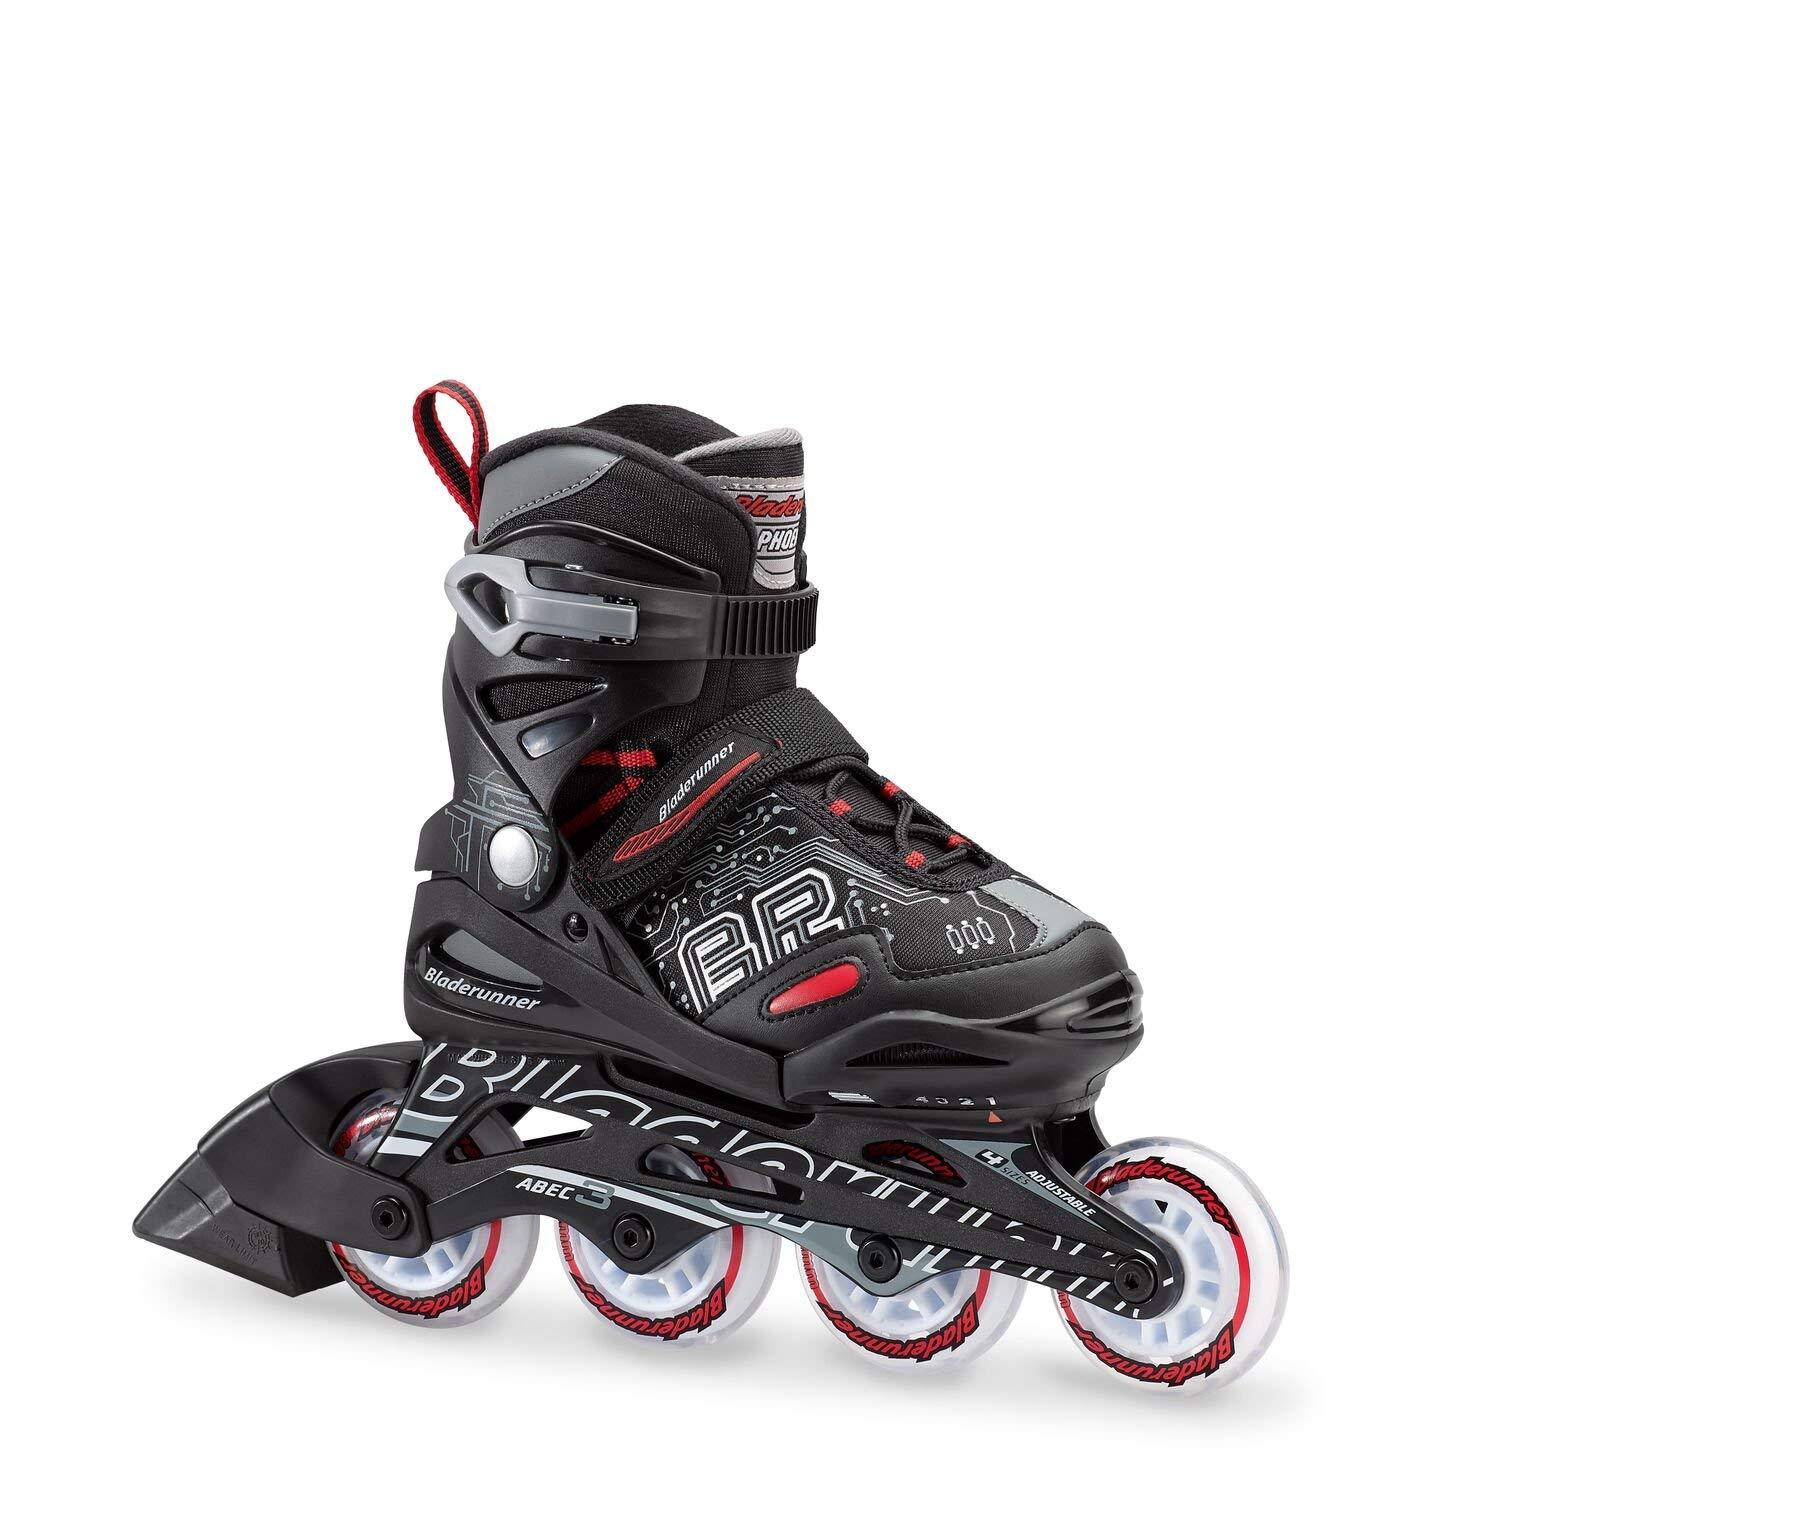 Bladerunner by Rollerblade Phoenix Boys Adjustable Fitness Inline Skate, Black and Red, Junior, Value Performance Inline Skates (Renewed)